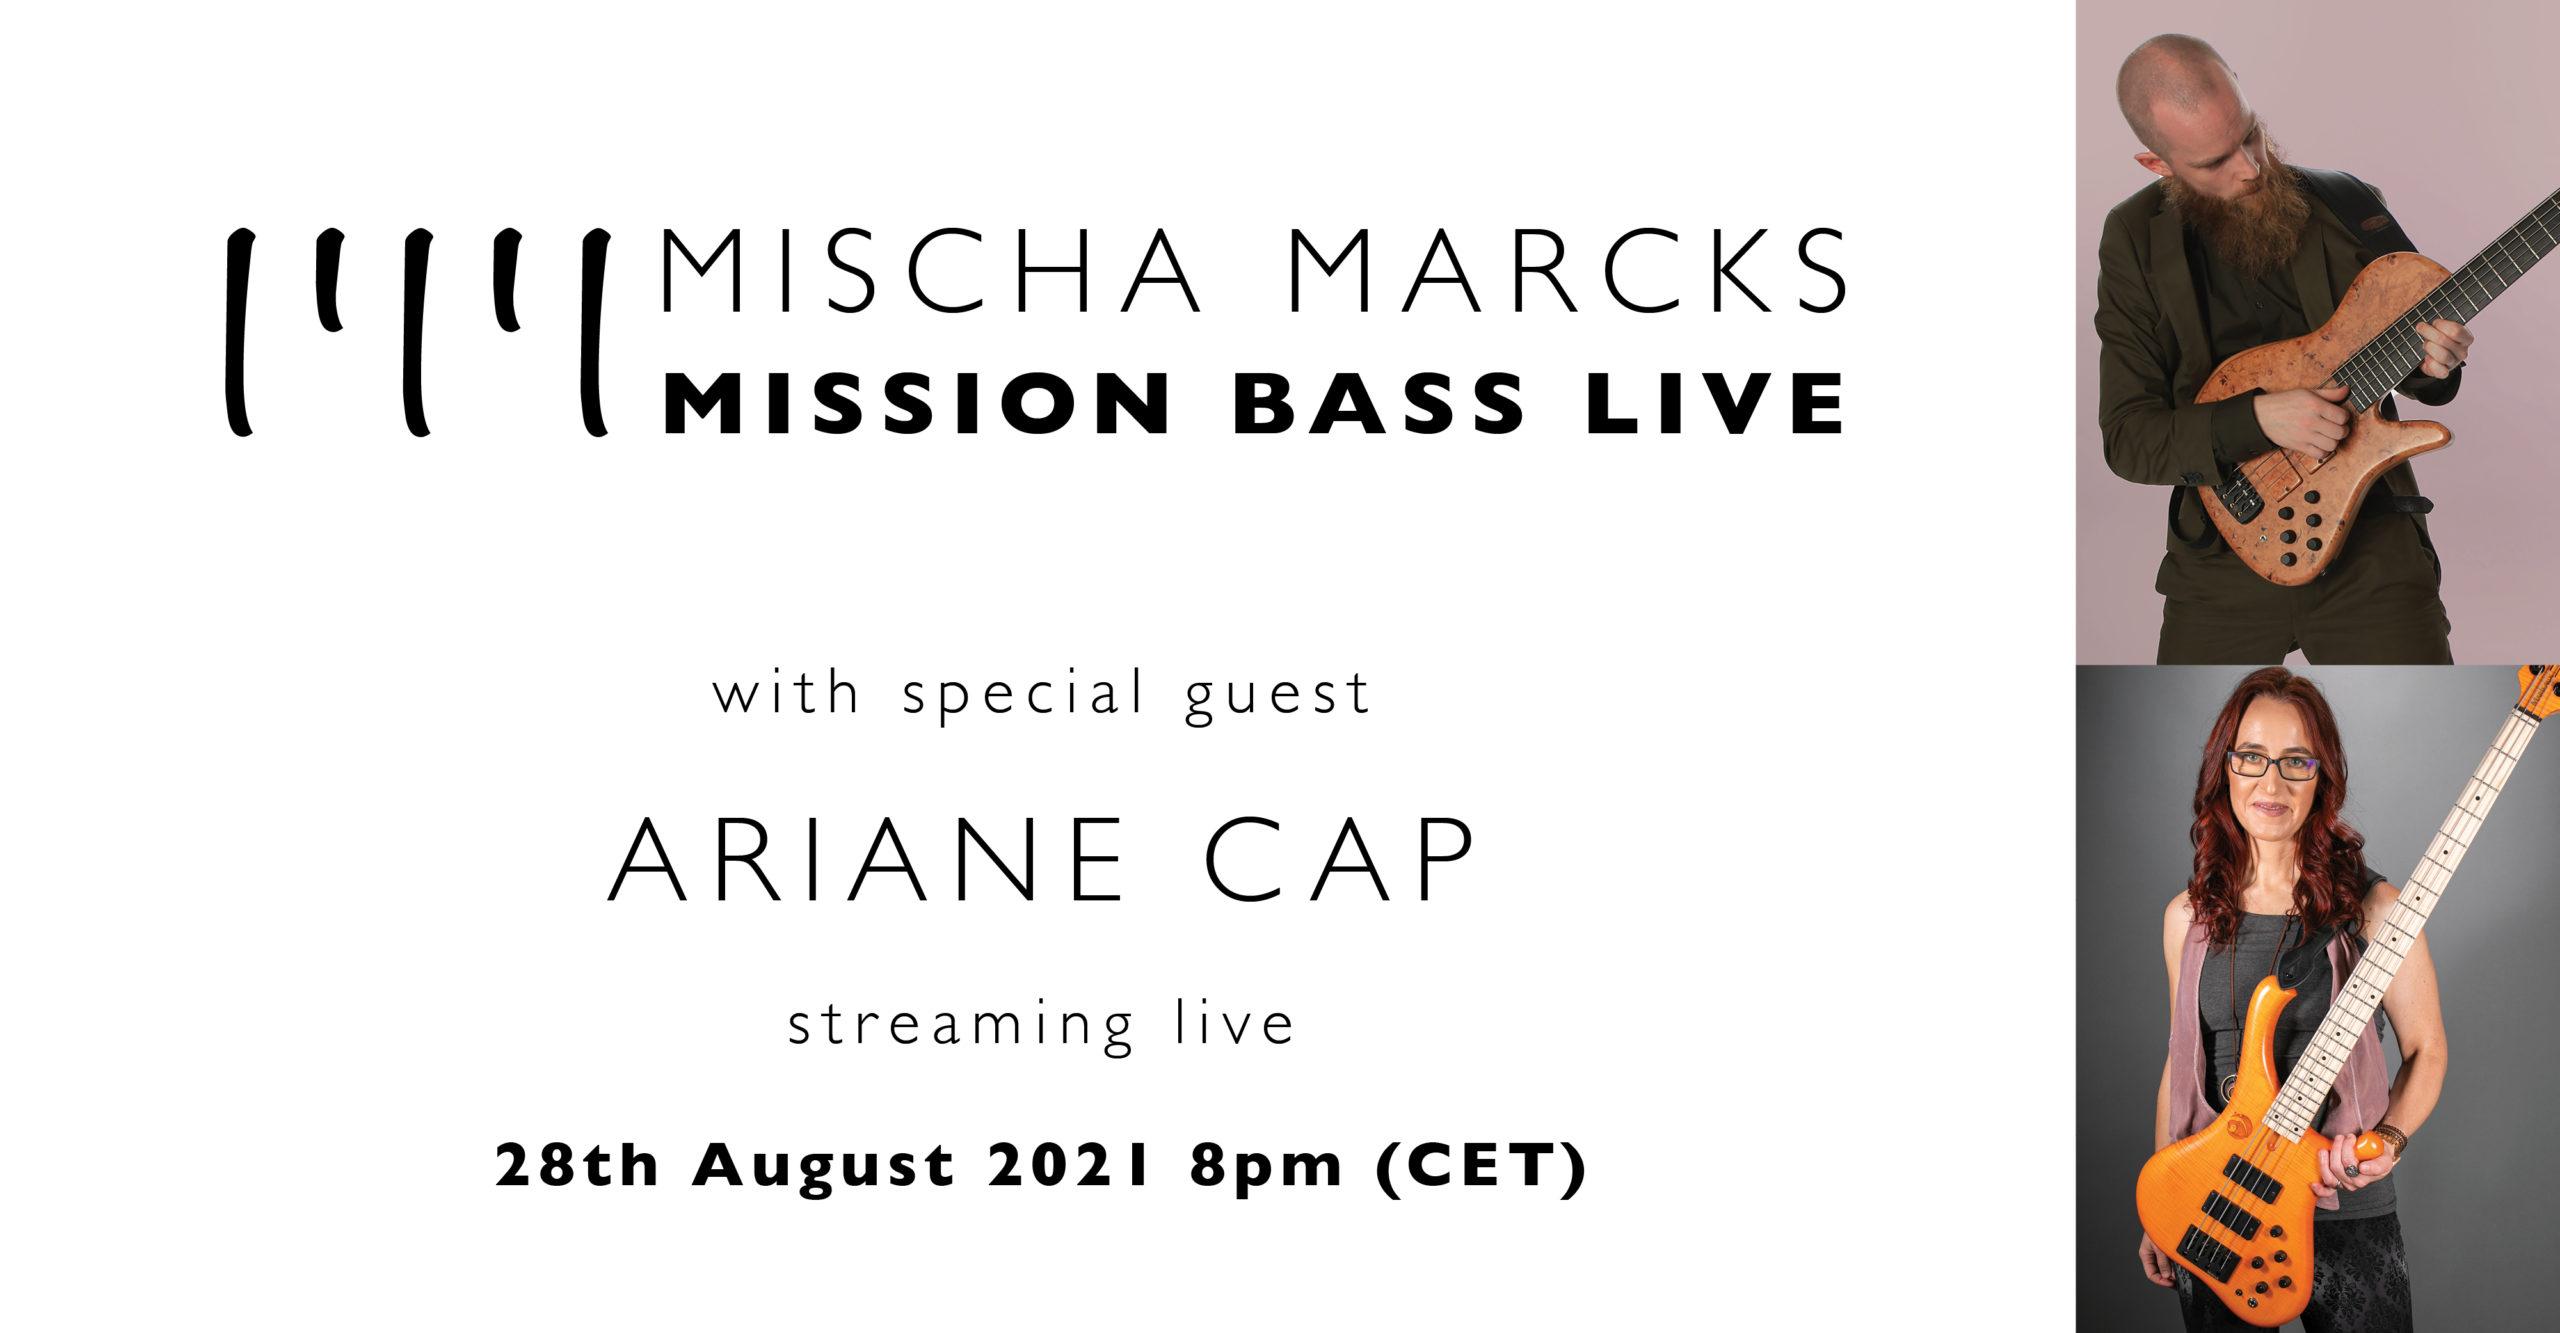 Mischa Marcks presents Mission Bass Live featuring Ariane Cap